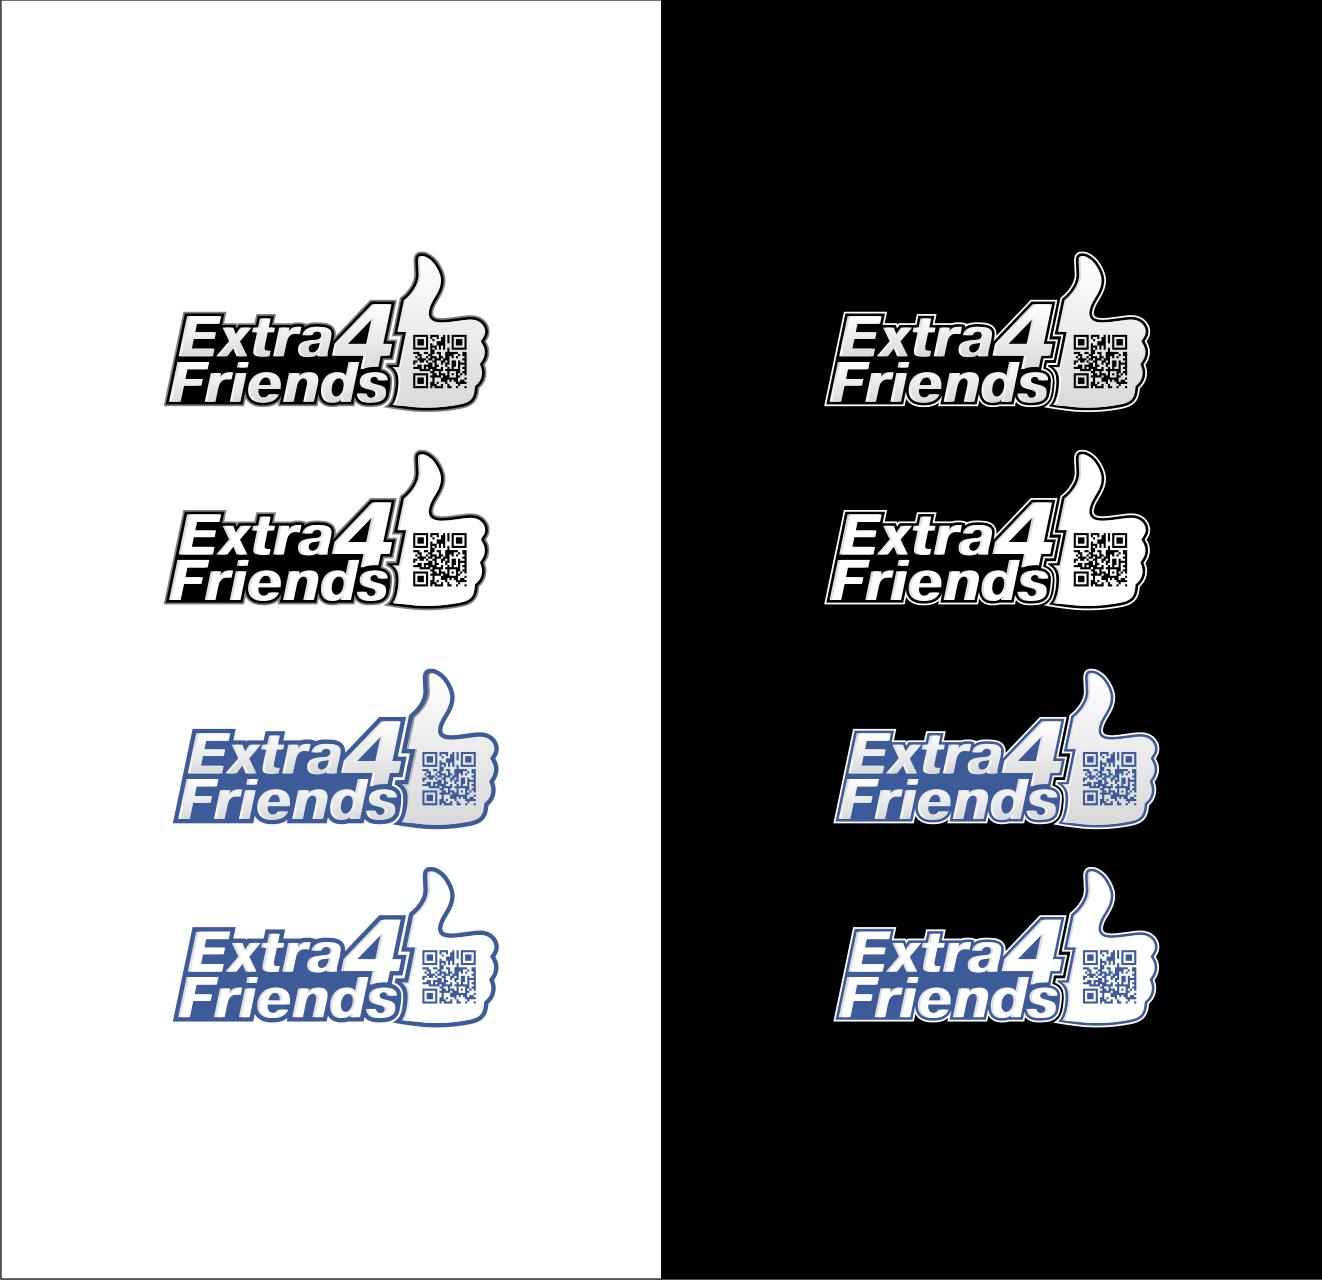 Extra4Friends logo